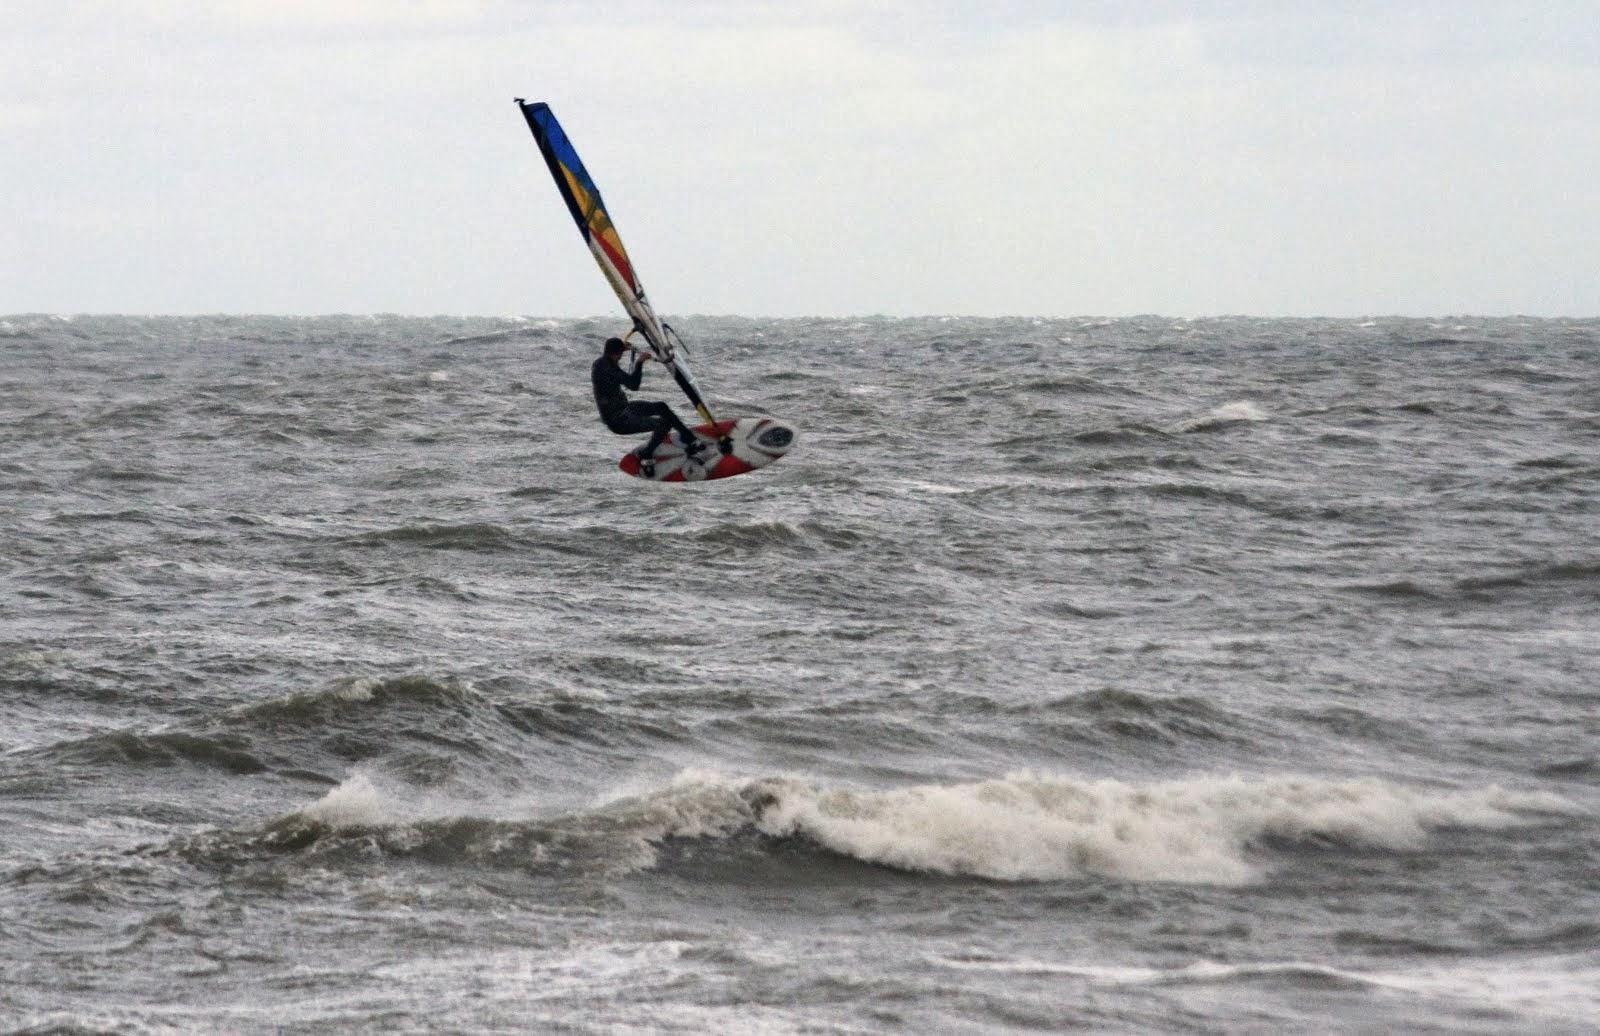 Maxim De Buck surfingmax@gmail.com